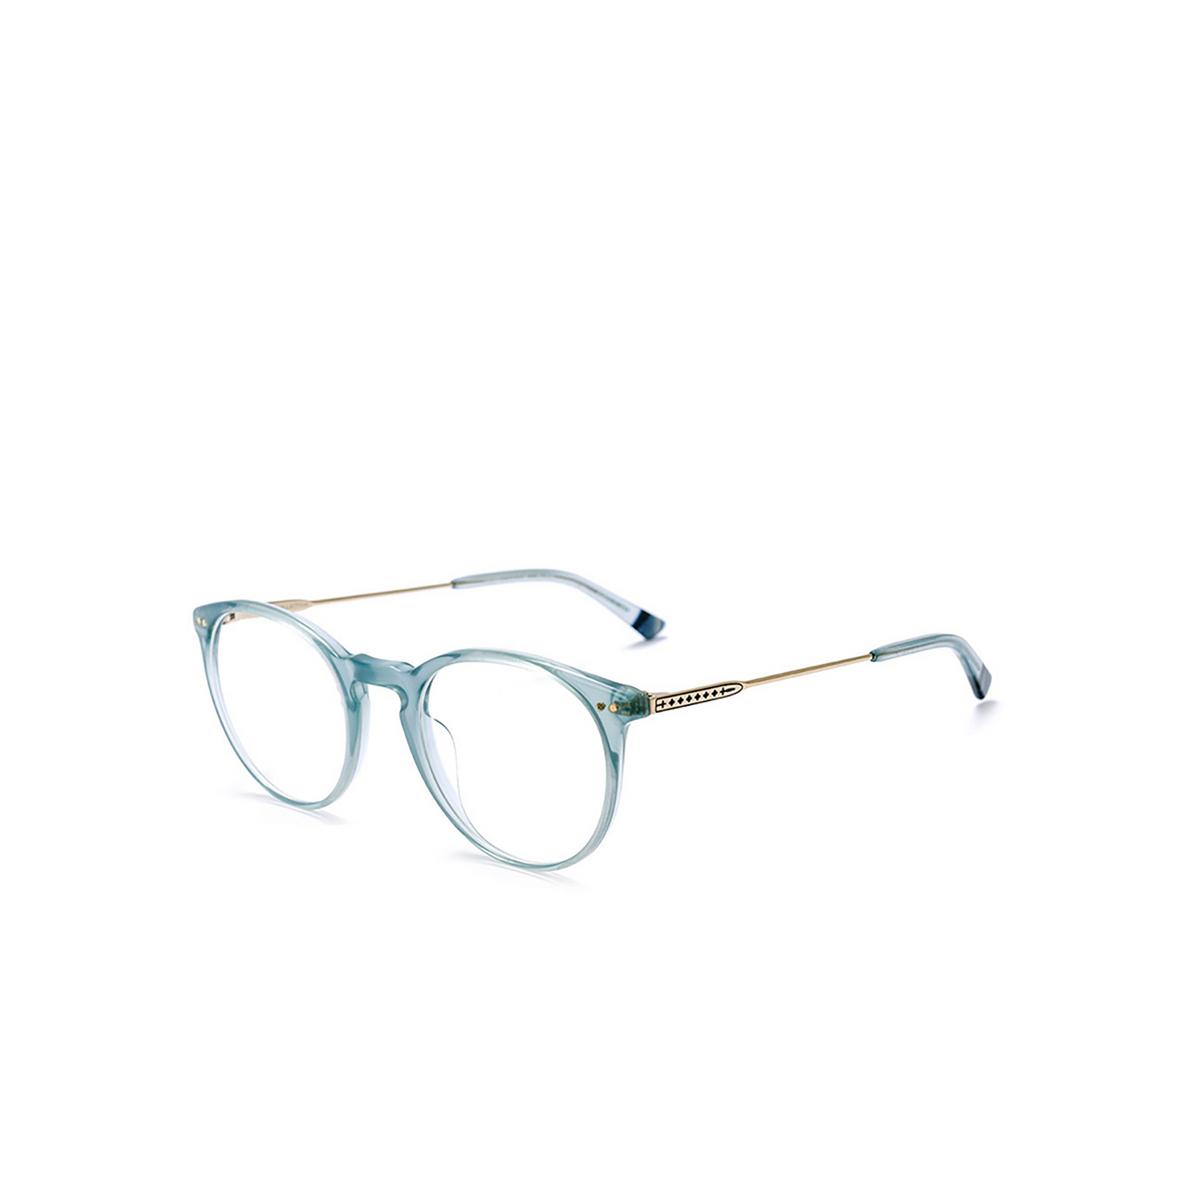 Etnia Barcelona® Round Eyeglasses: Jordaan Met color Blgd - three-quarters view.